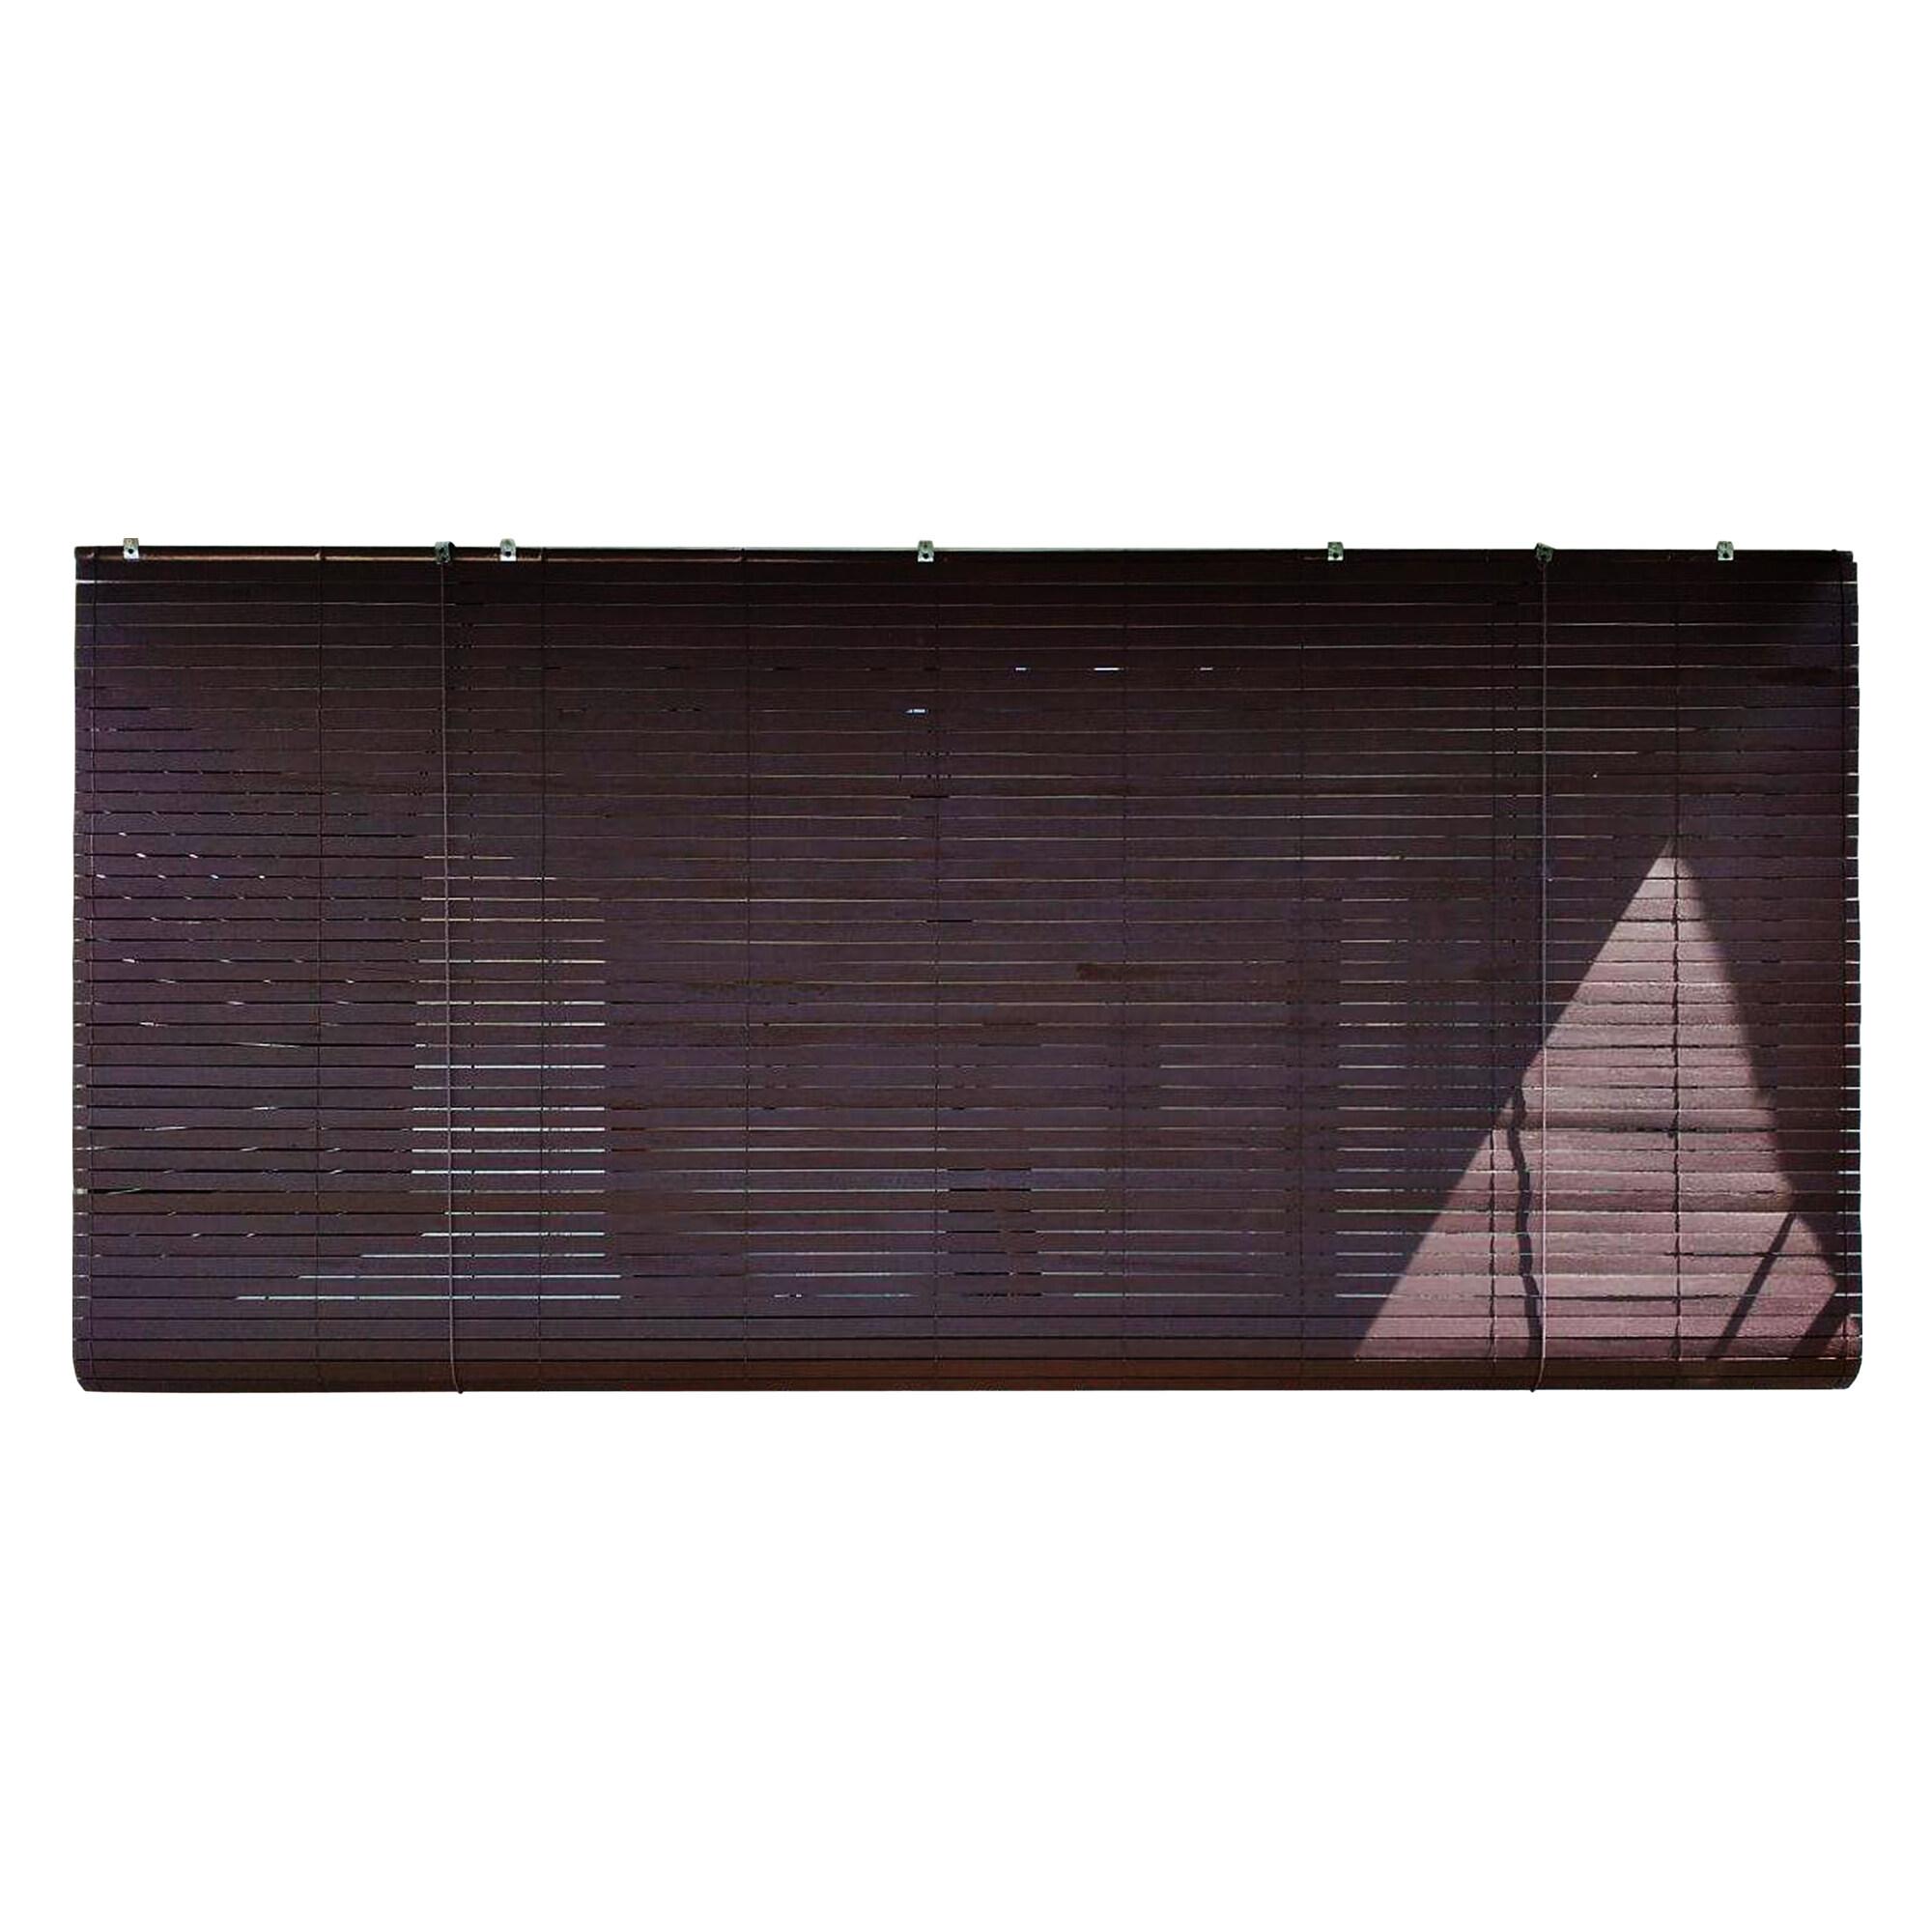 Homez Solid Blinds (W) 6 ft x (H) 6 ft 100% Meranti Wood Wooden Blinds - (Wenge) - intl